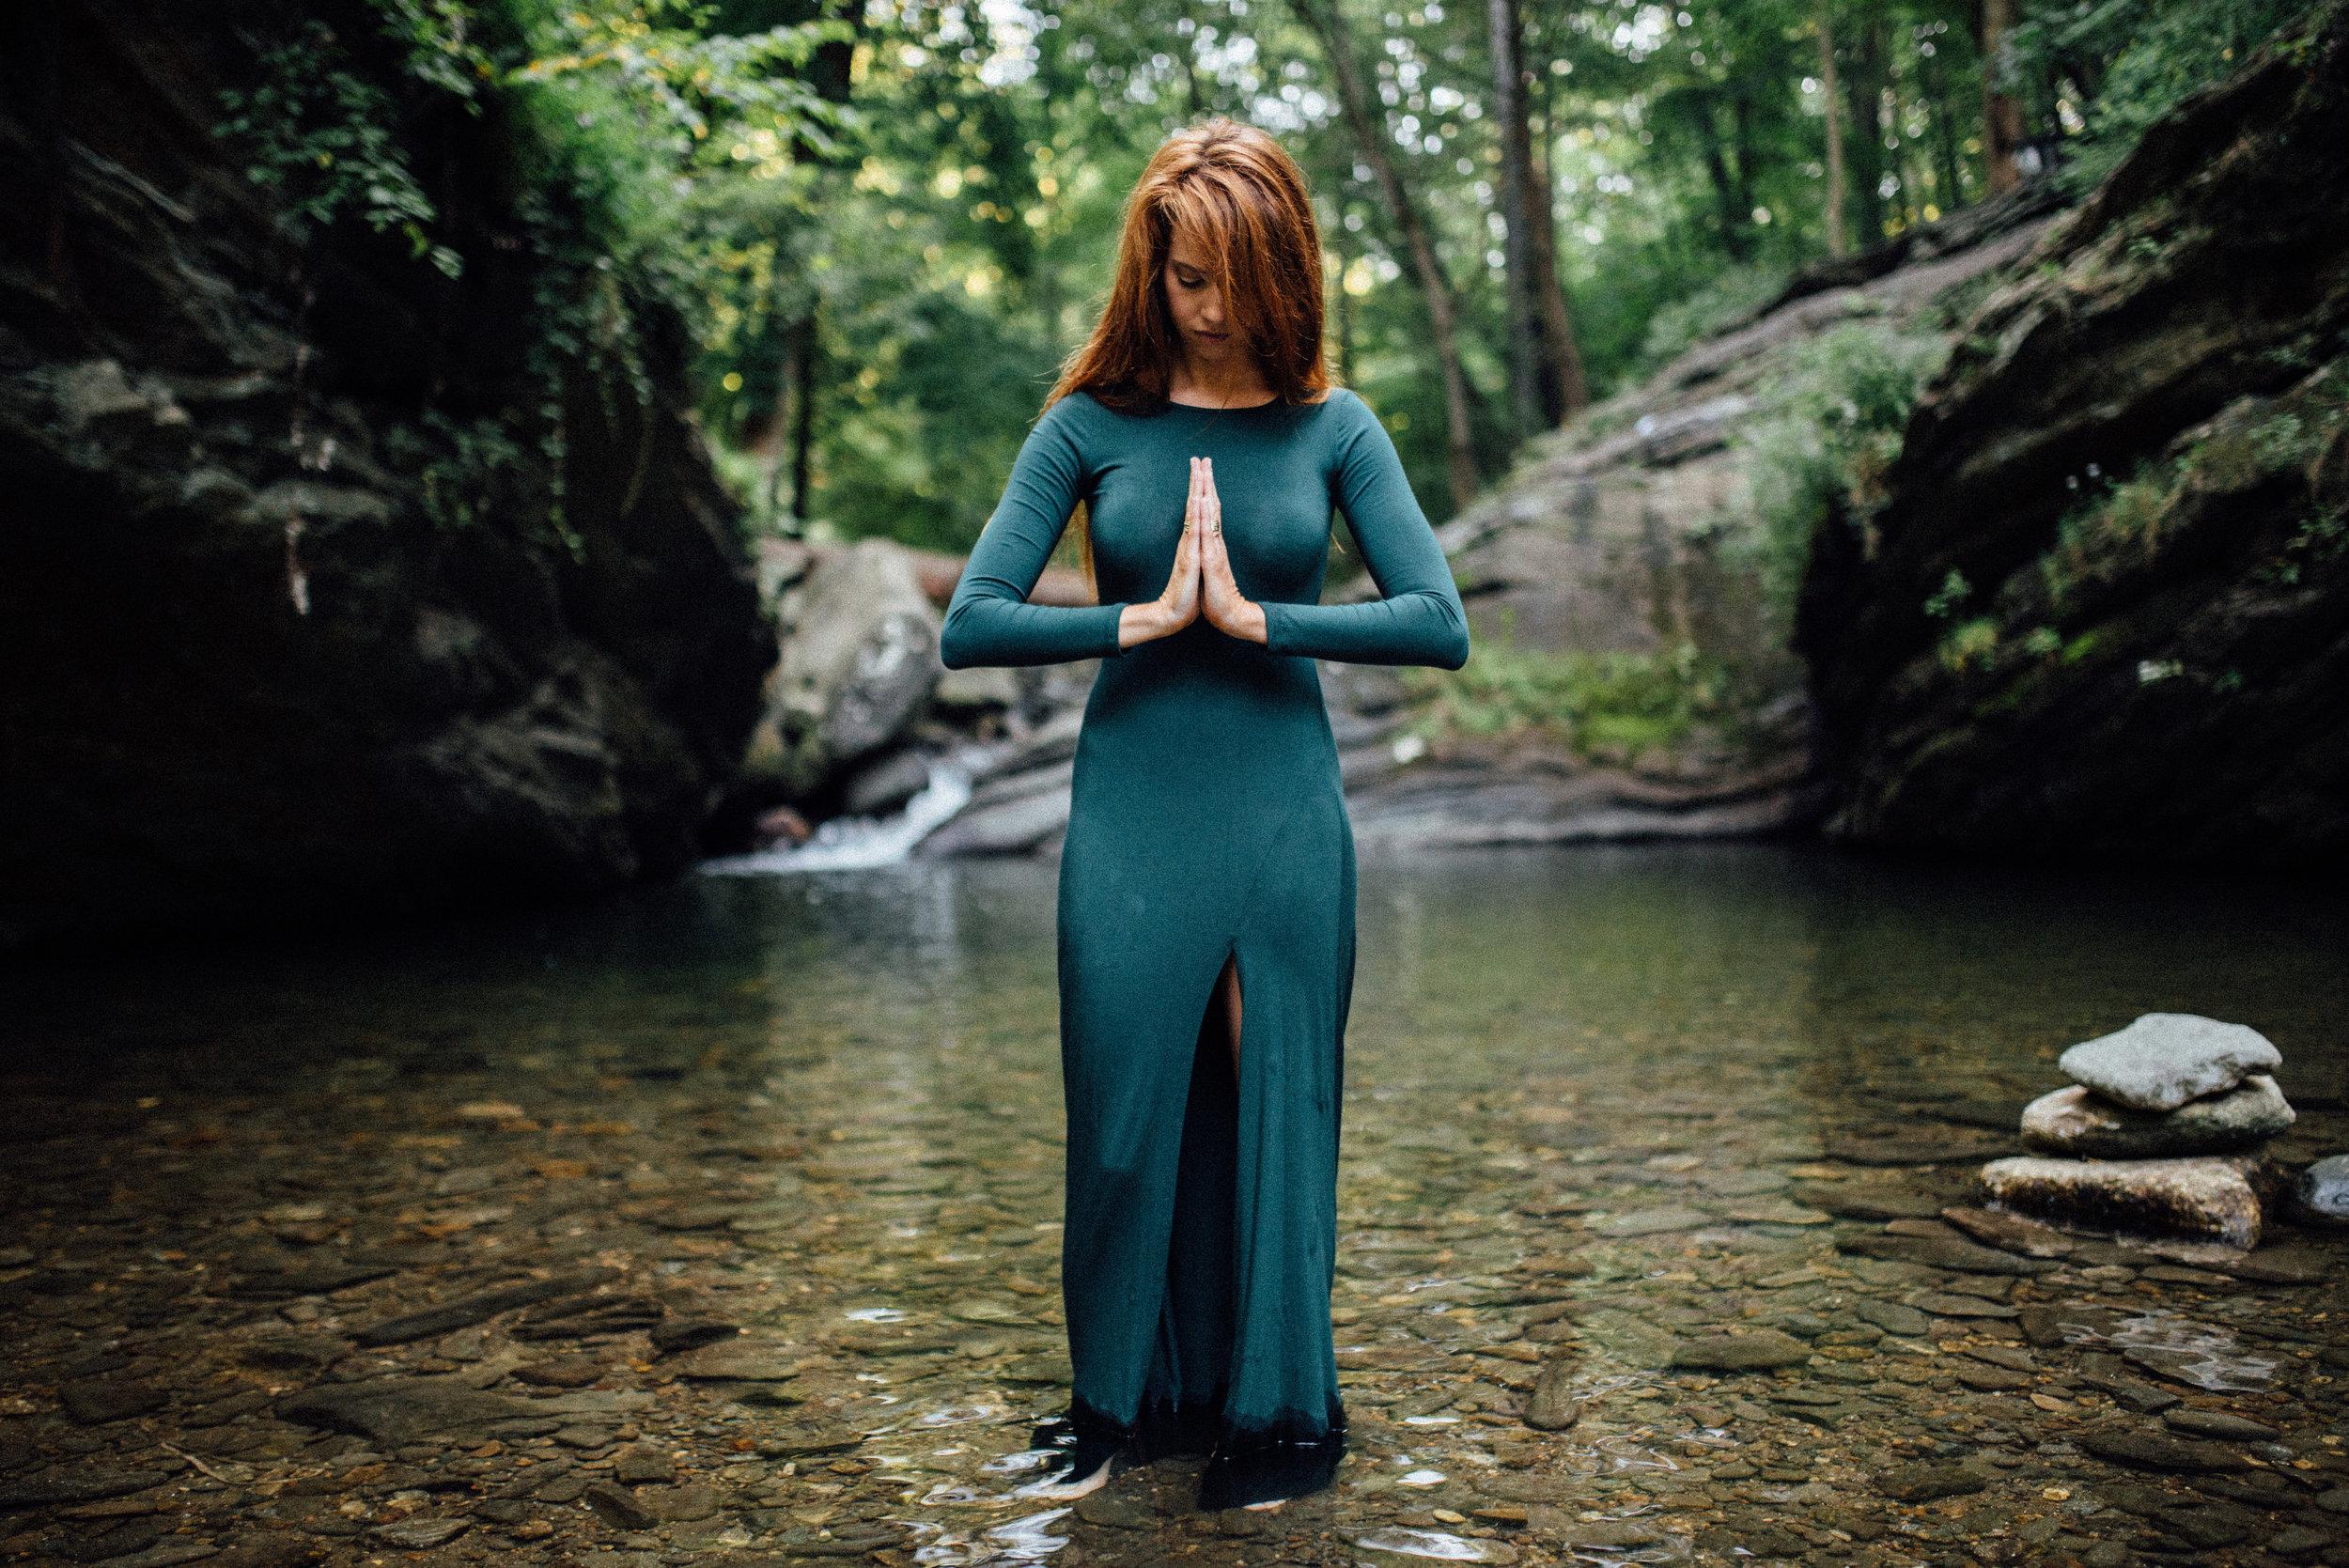 prayer pose kelly smaller.jpeg